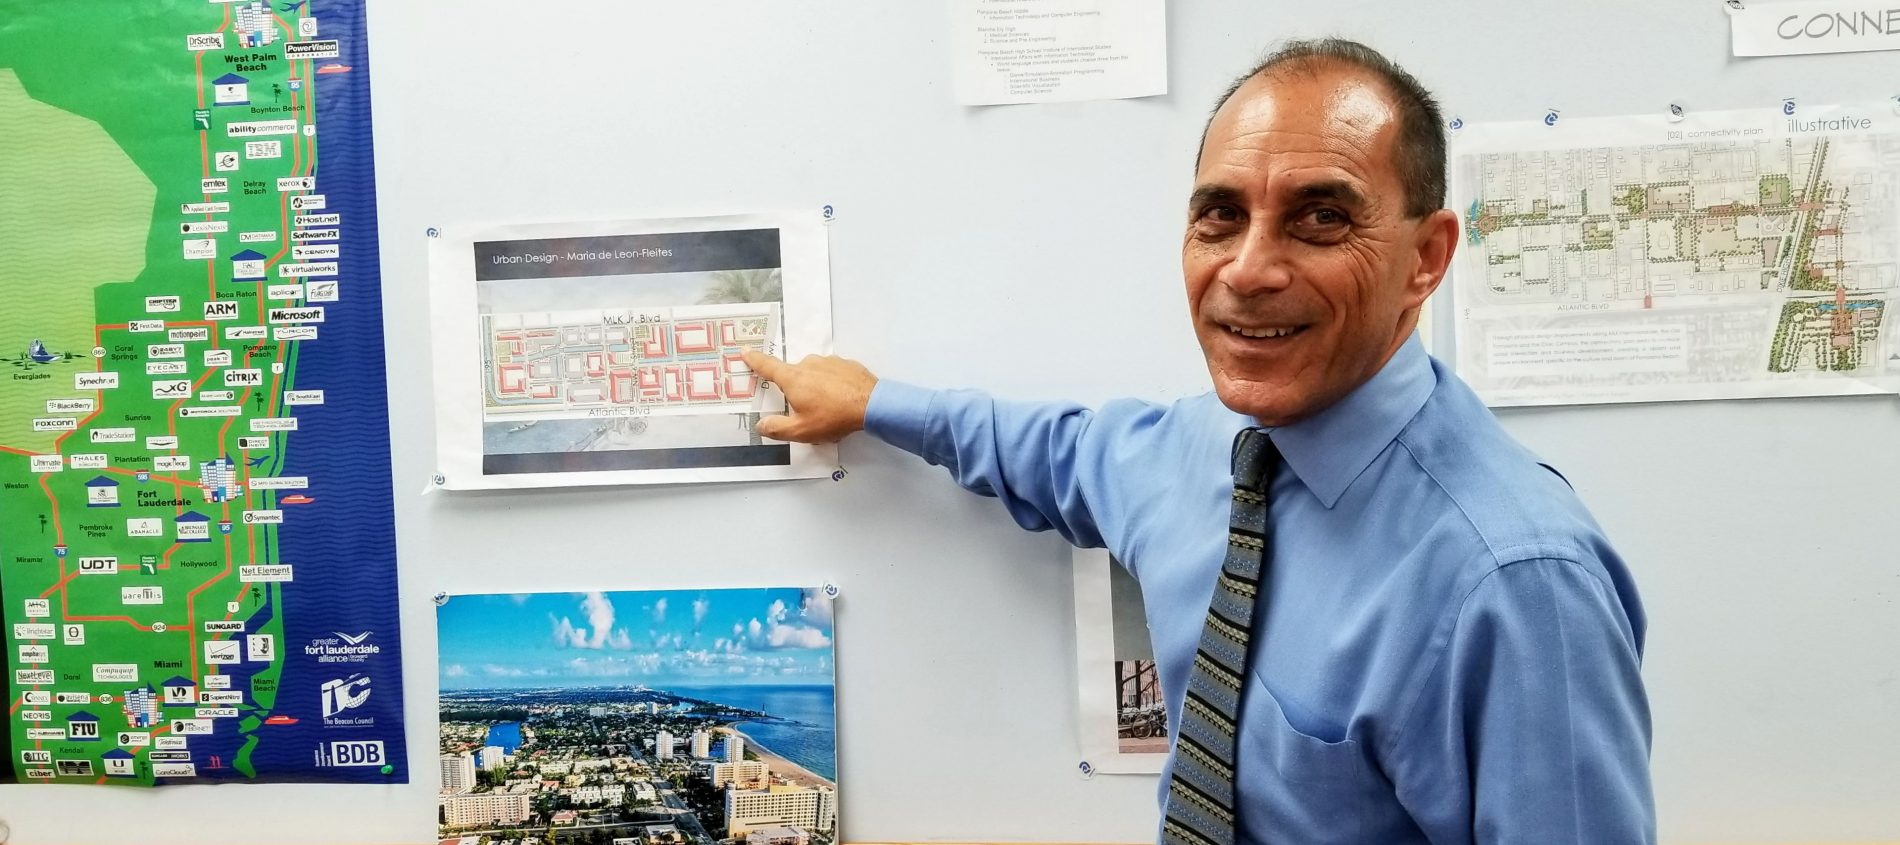 Horacio Danovich with big plans to revitalize downtown Pompano Beach